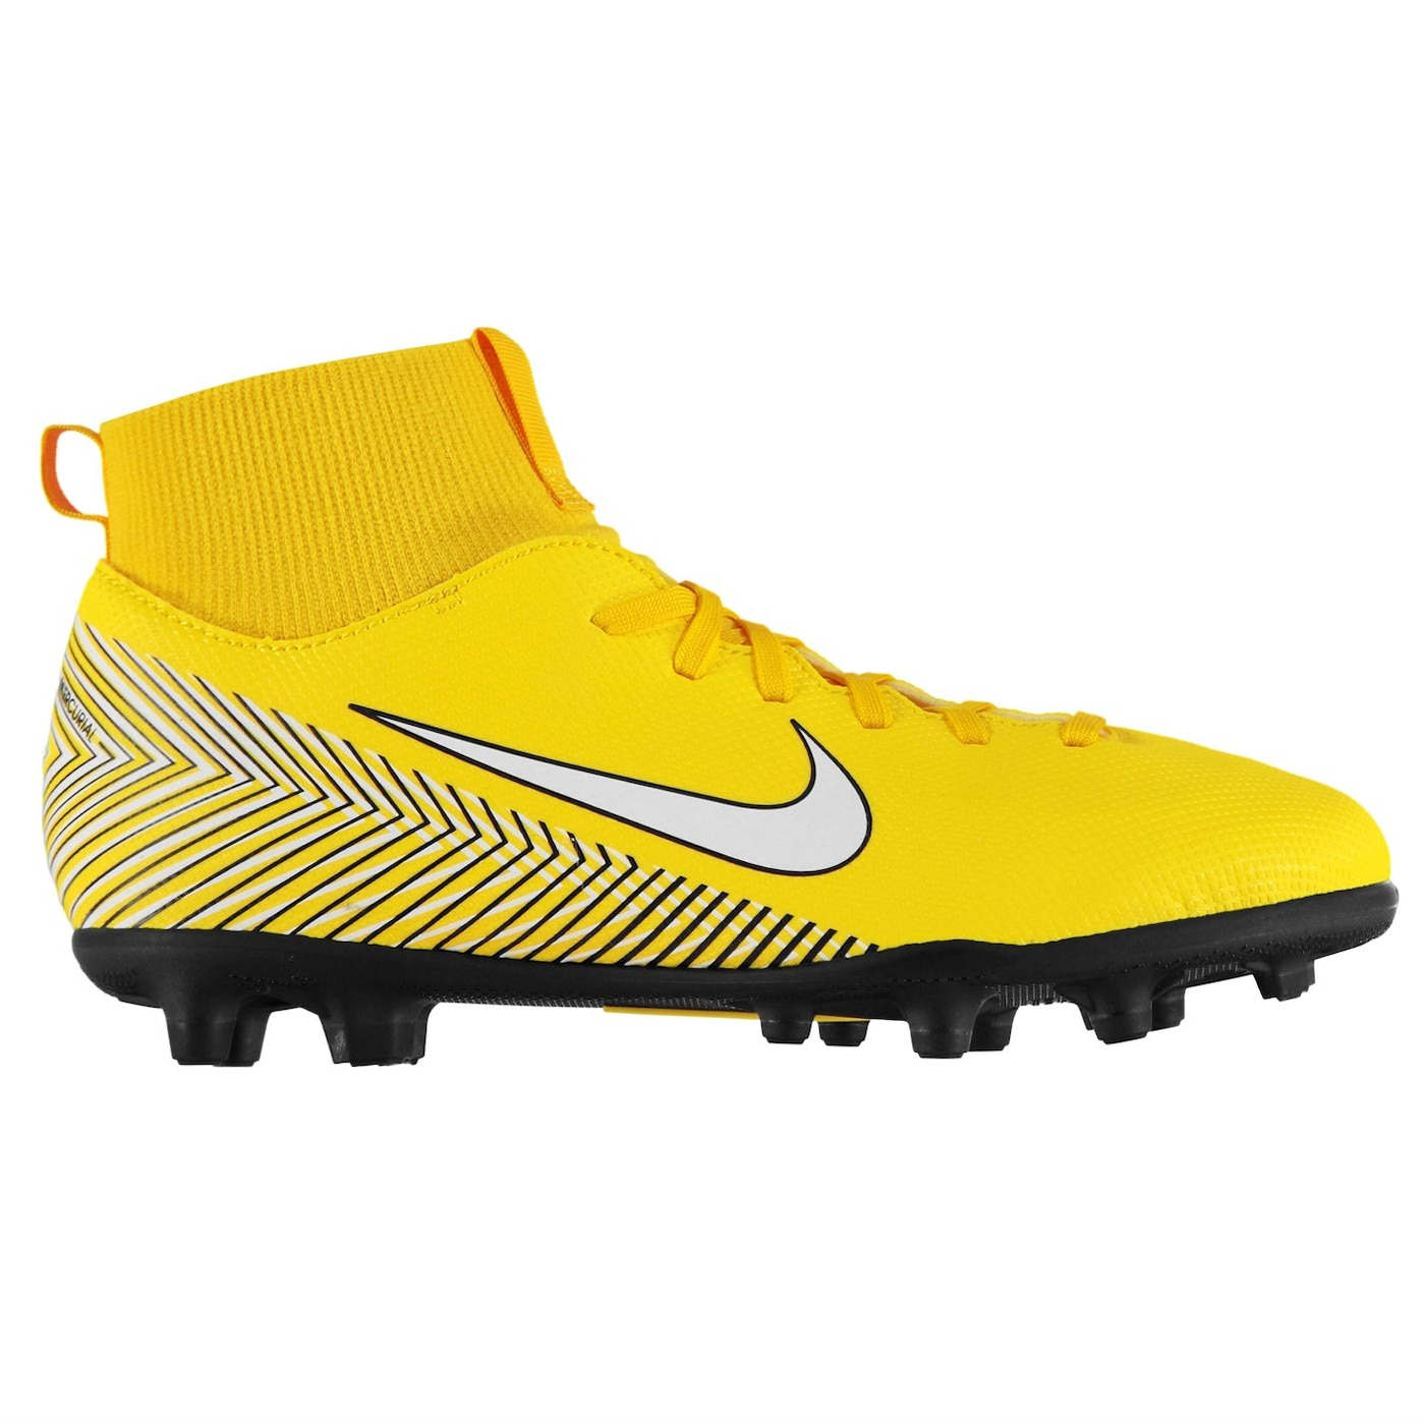 arrives e12cf be0bf Nike Mercurial Superfly Club Neymar Jr DF Junior FG Football Boots